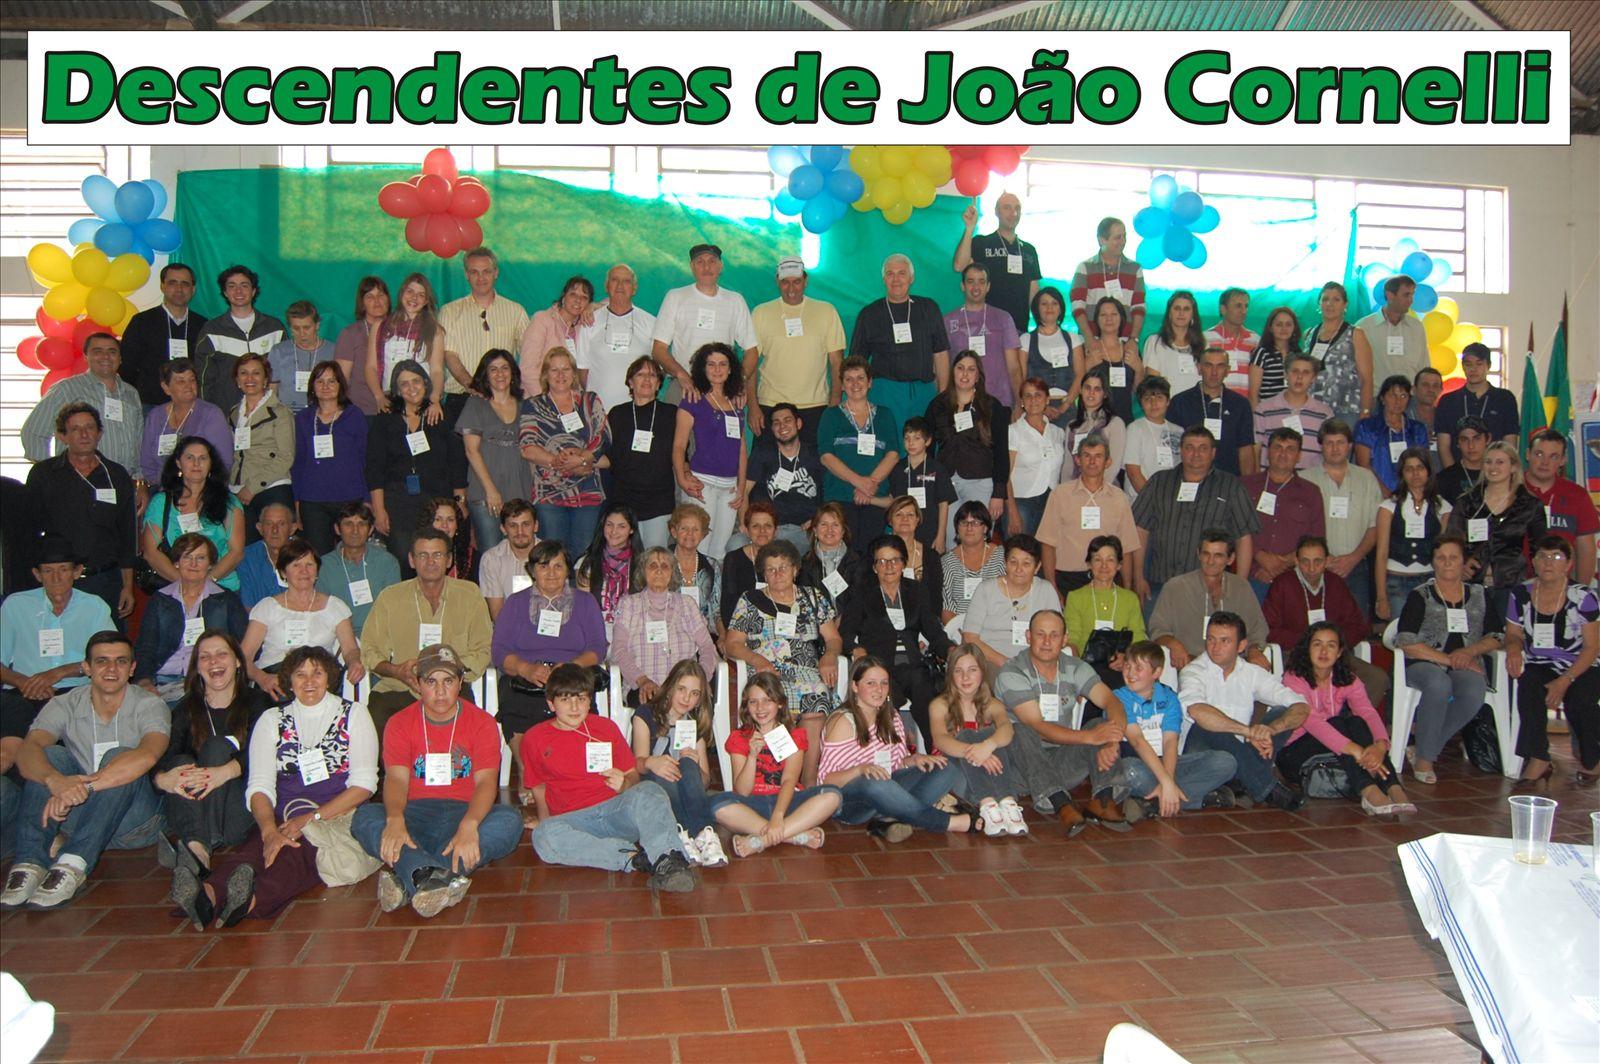 Descendentes_de_João_Cornelli_02_0